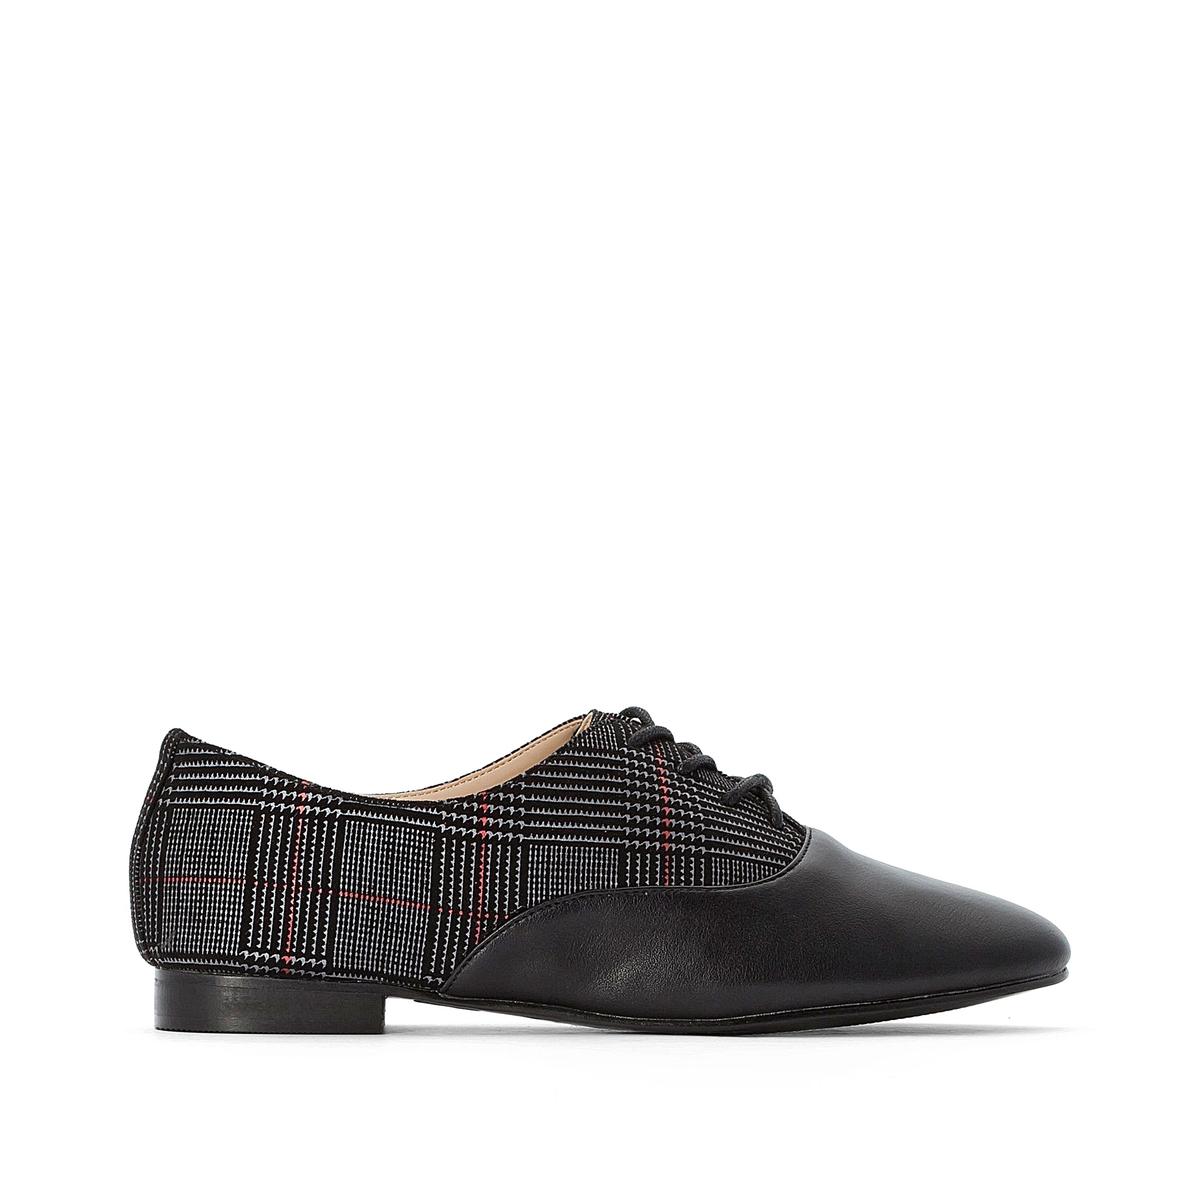 Ботинки-дерби La Redoute На шнуровке 44 черный дерби malatesta дерби